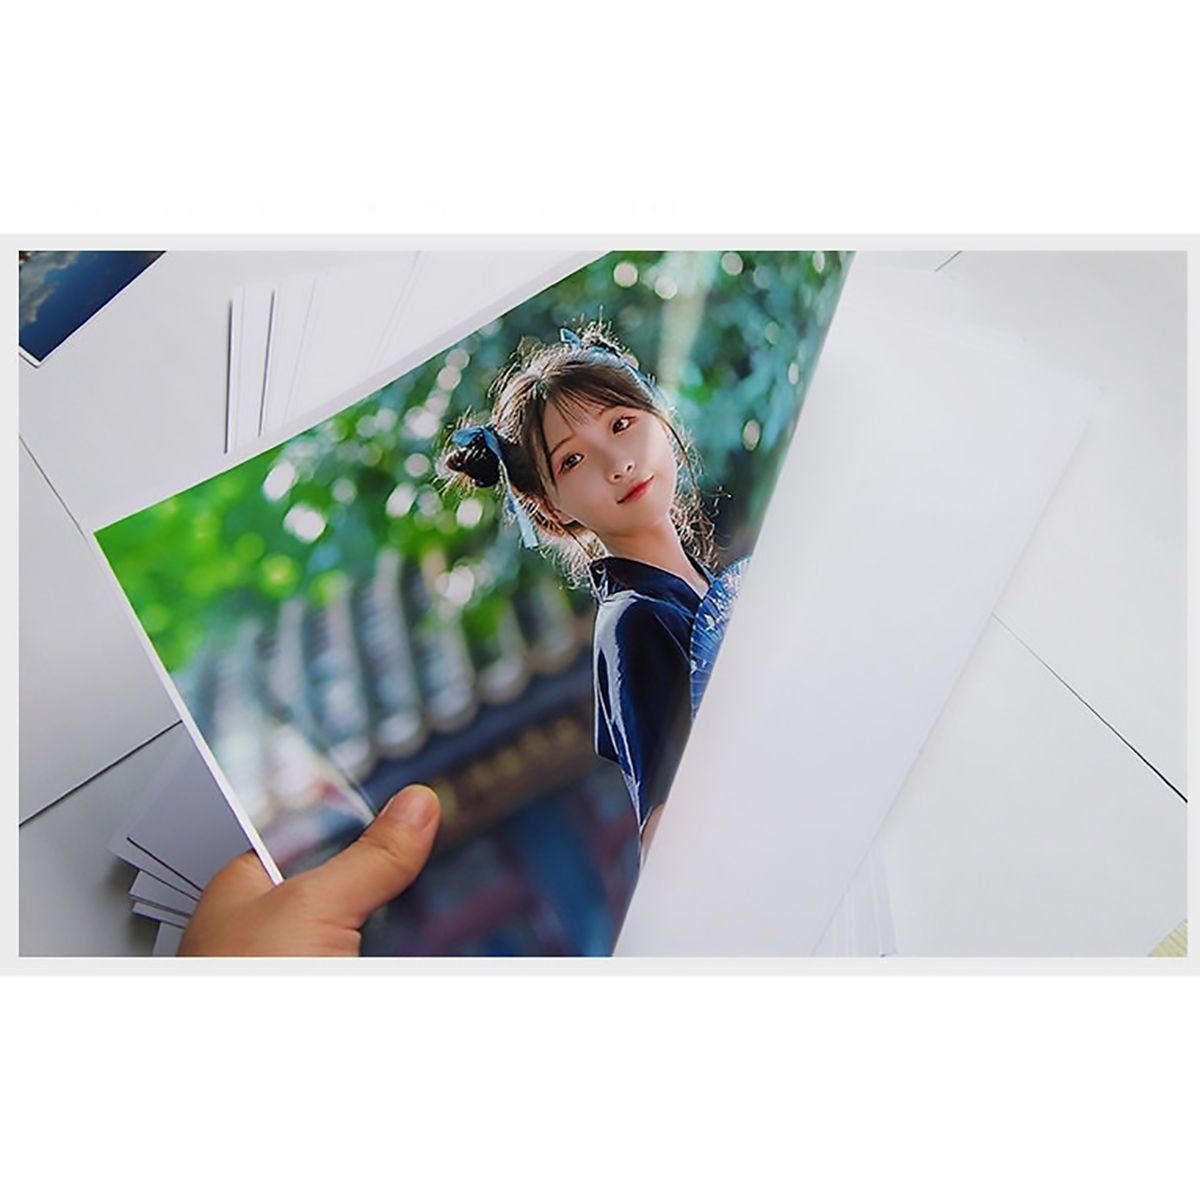 Papel Fotográfico A4 Dupla Face 180g Glossy Branco Brilhante Resistente à Água / 100 folhas